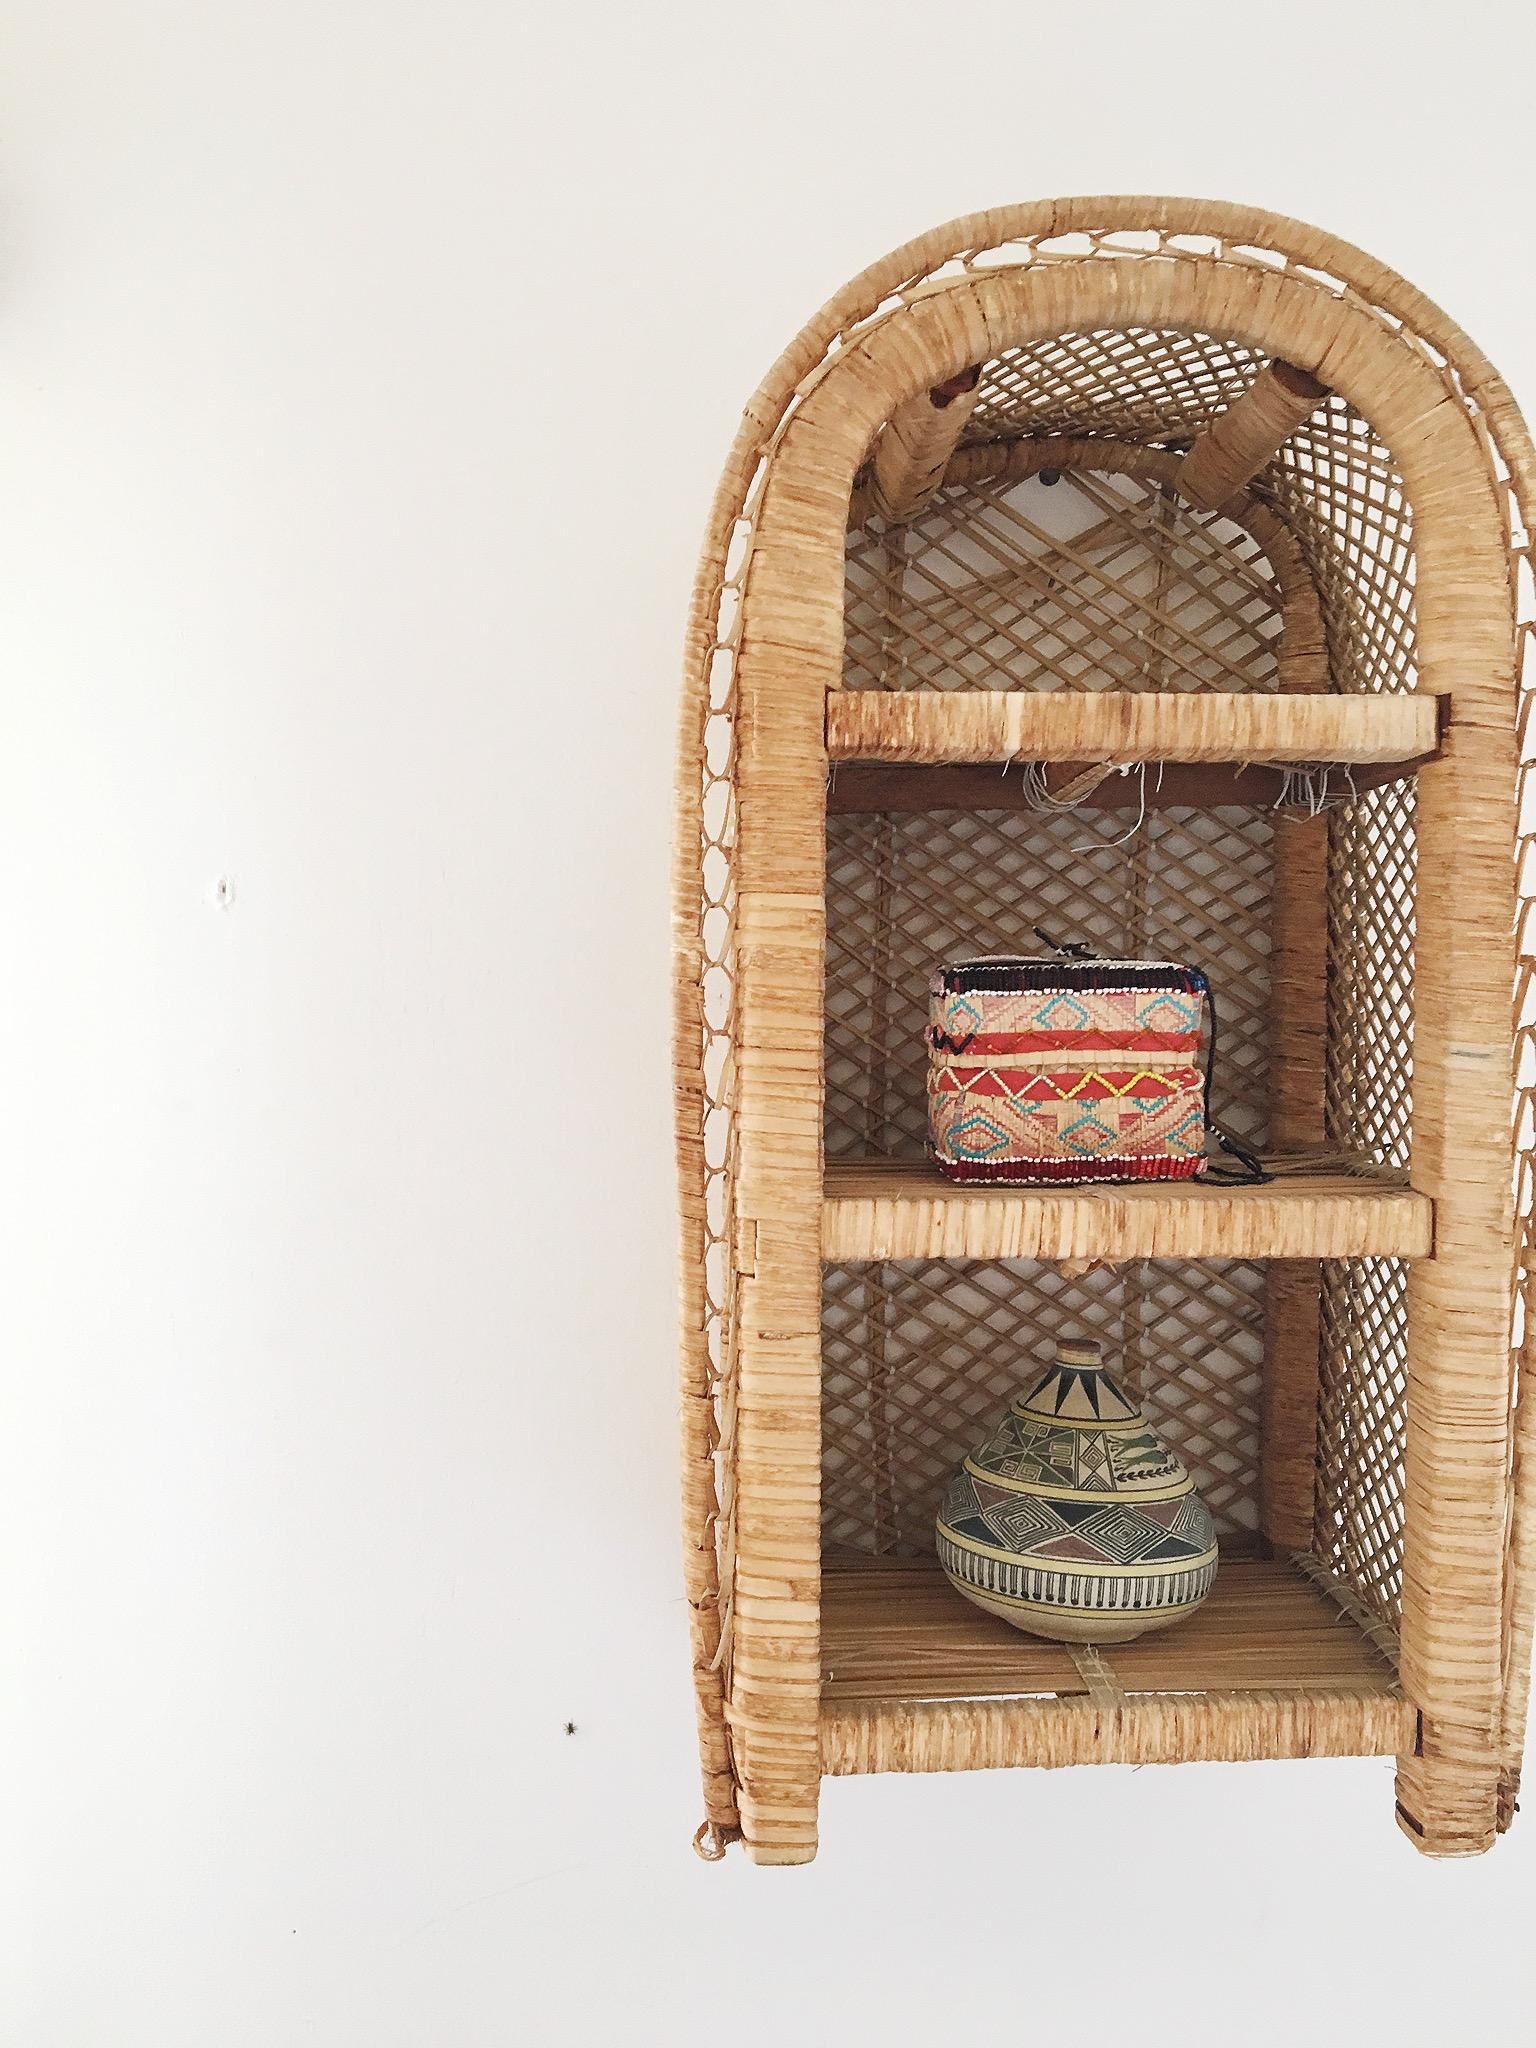 California Boho Modern Style Baskets on walls